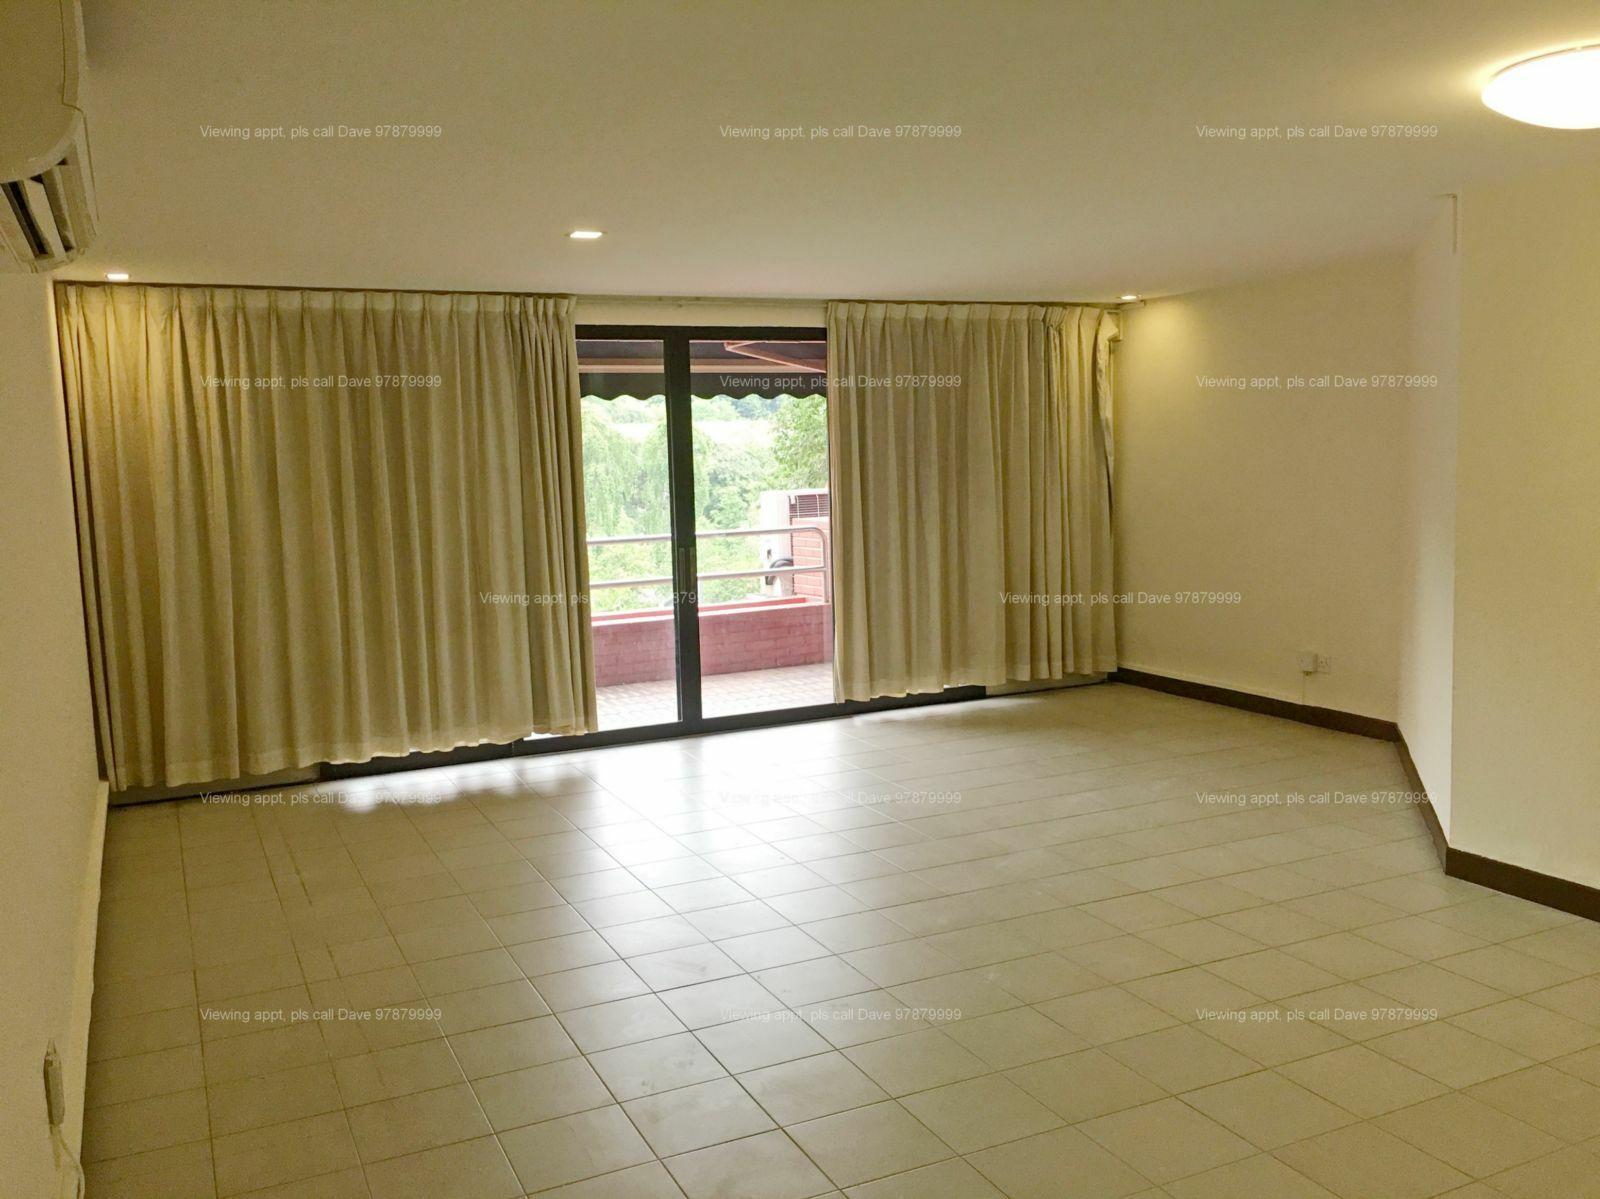 Astoria Apartment 6a Cairnhill Rise 1 Bedroom 980 Sqft Condominiums Apartments And